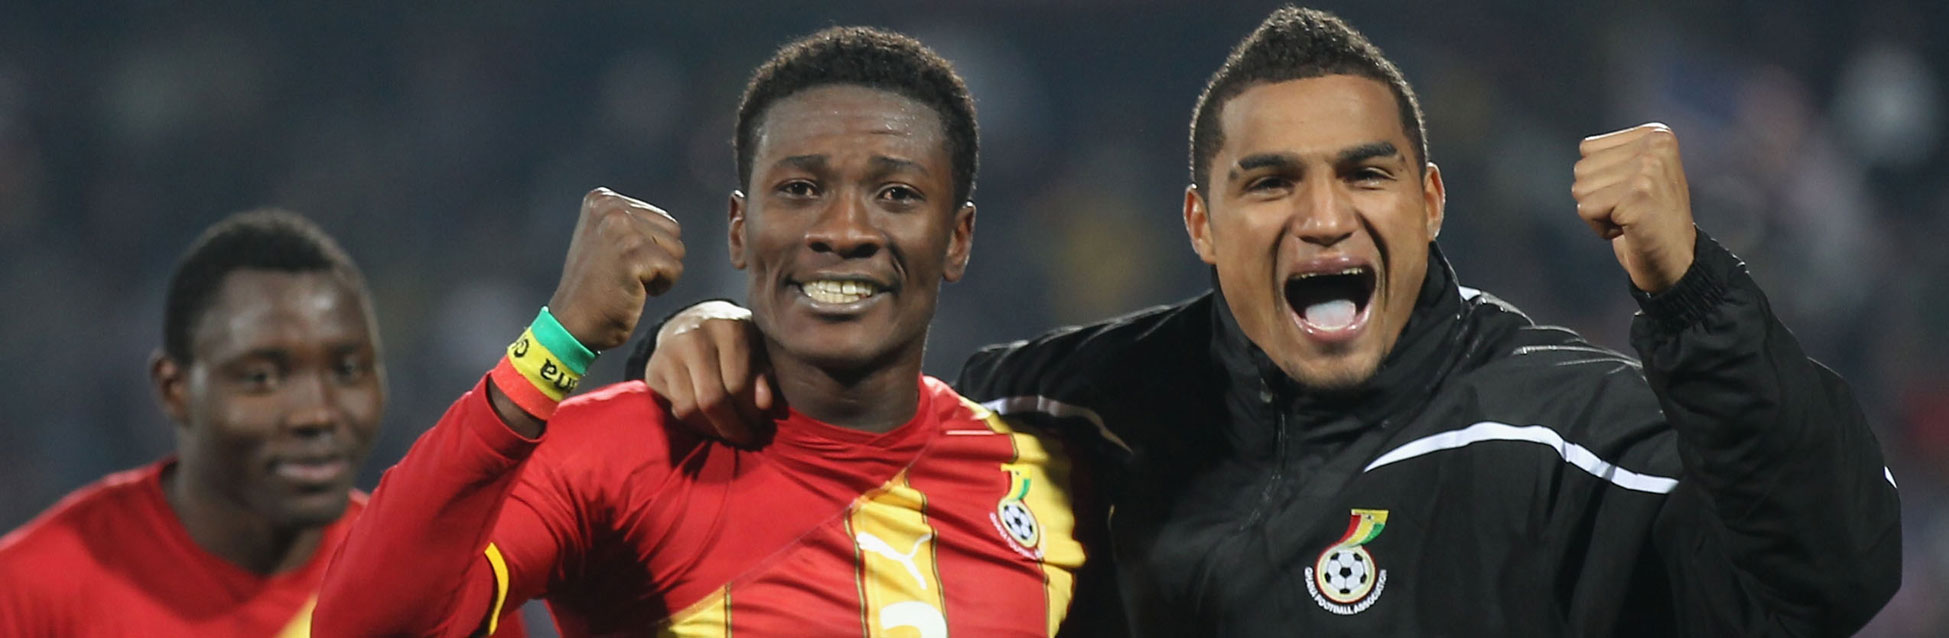 Asamoah Gyan y Kevin Prince Boateng